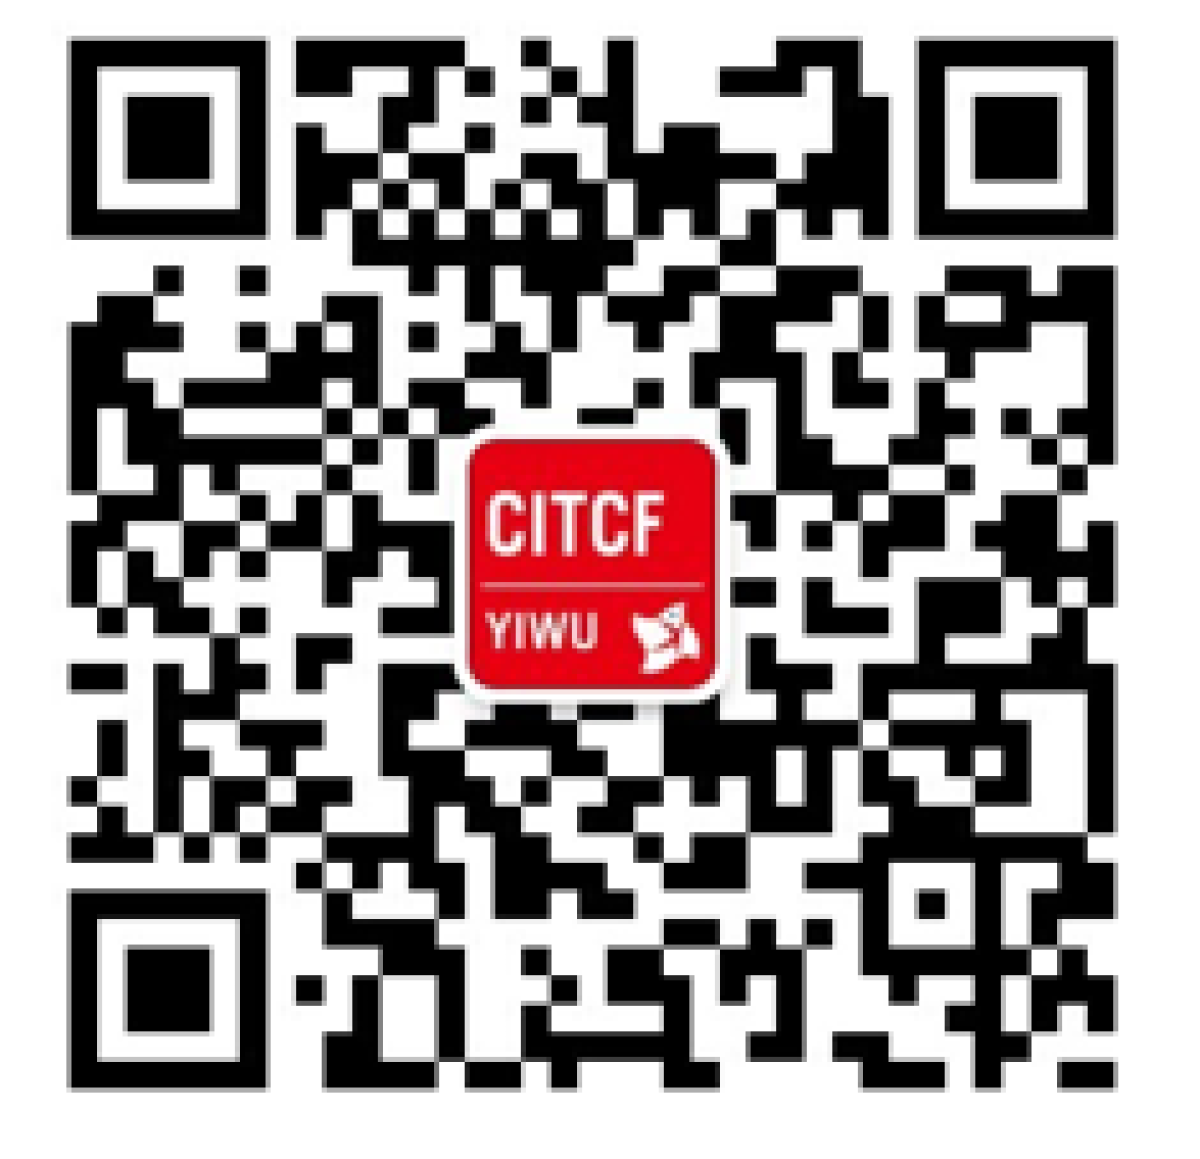 TIM截图20180412114250.png